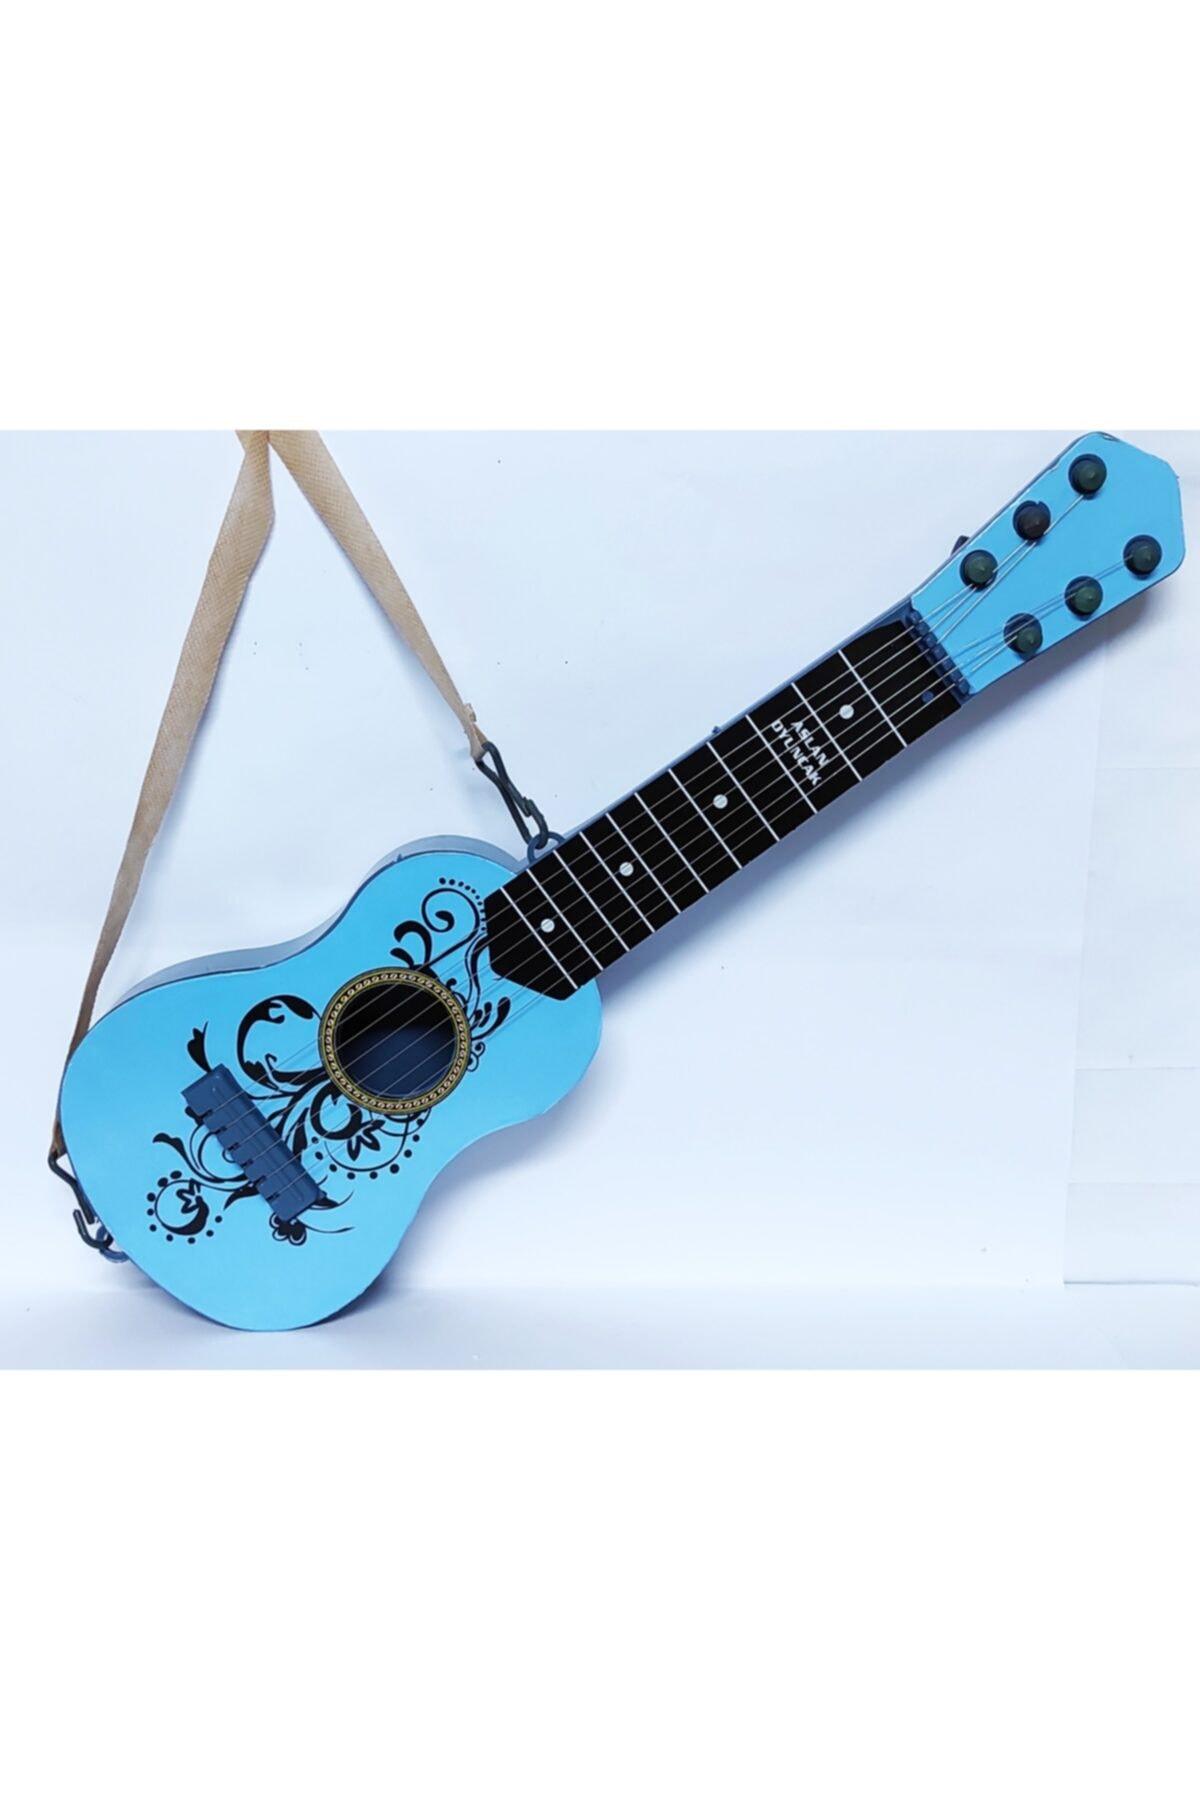 Brother Toys 48 Cm. Boyunda Oyuncak Mavi Ispanyol Gitar 1